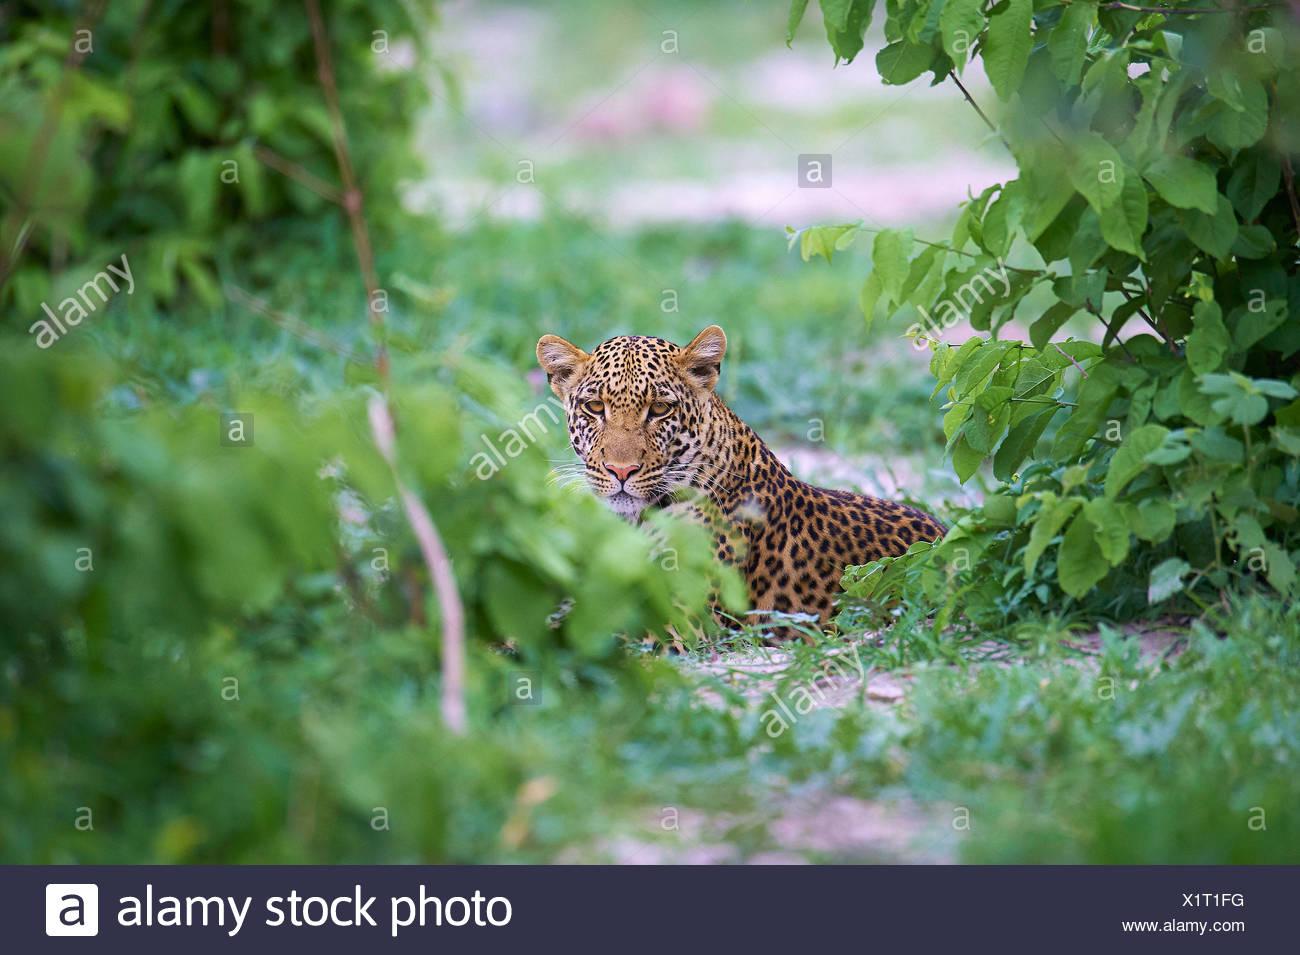 Botswana, Africa, leopard, Savuti, bushes, thicket, animal, Stock Photo